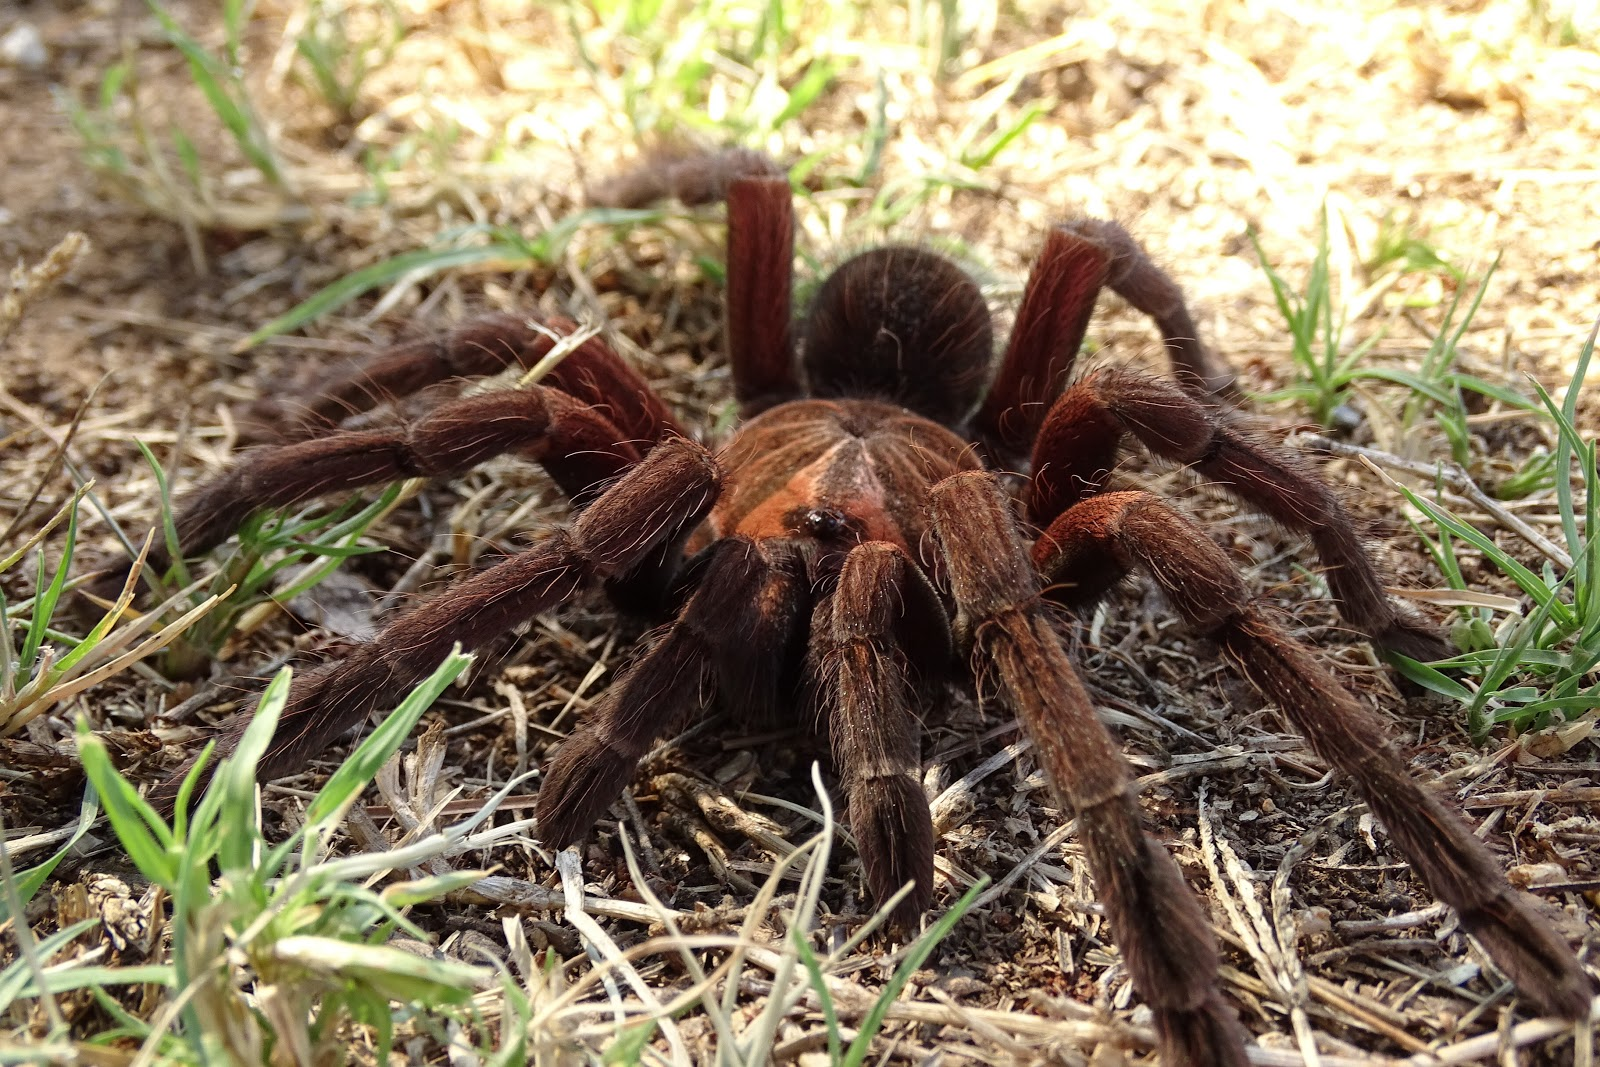 Arañas pollitos